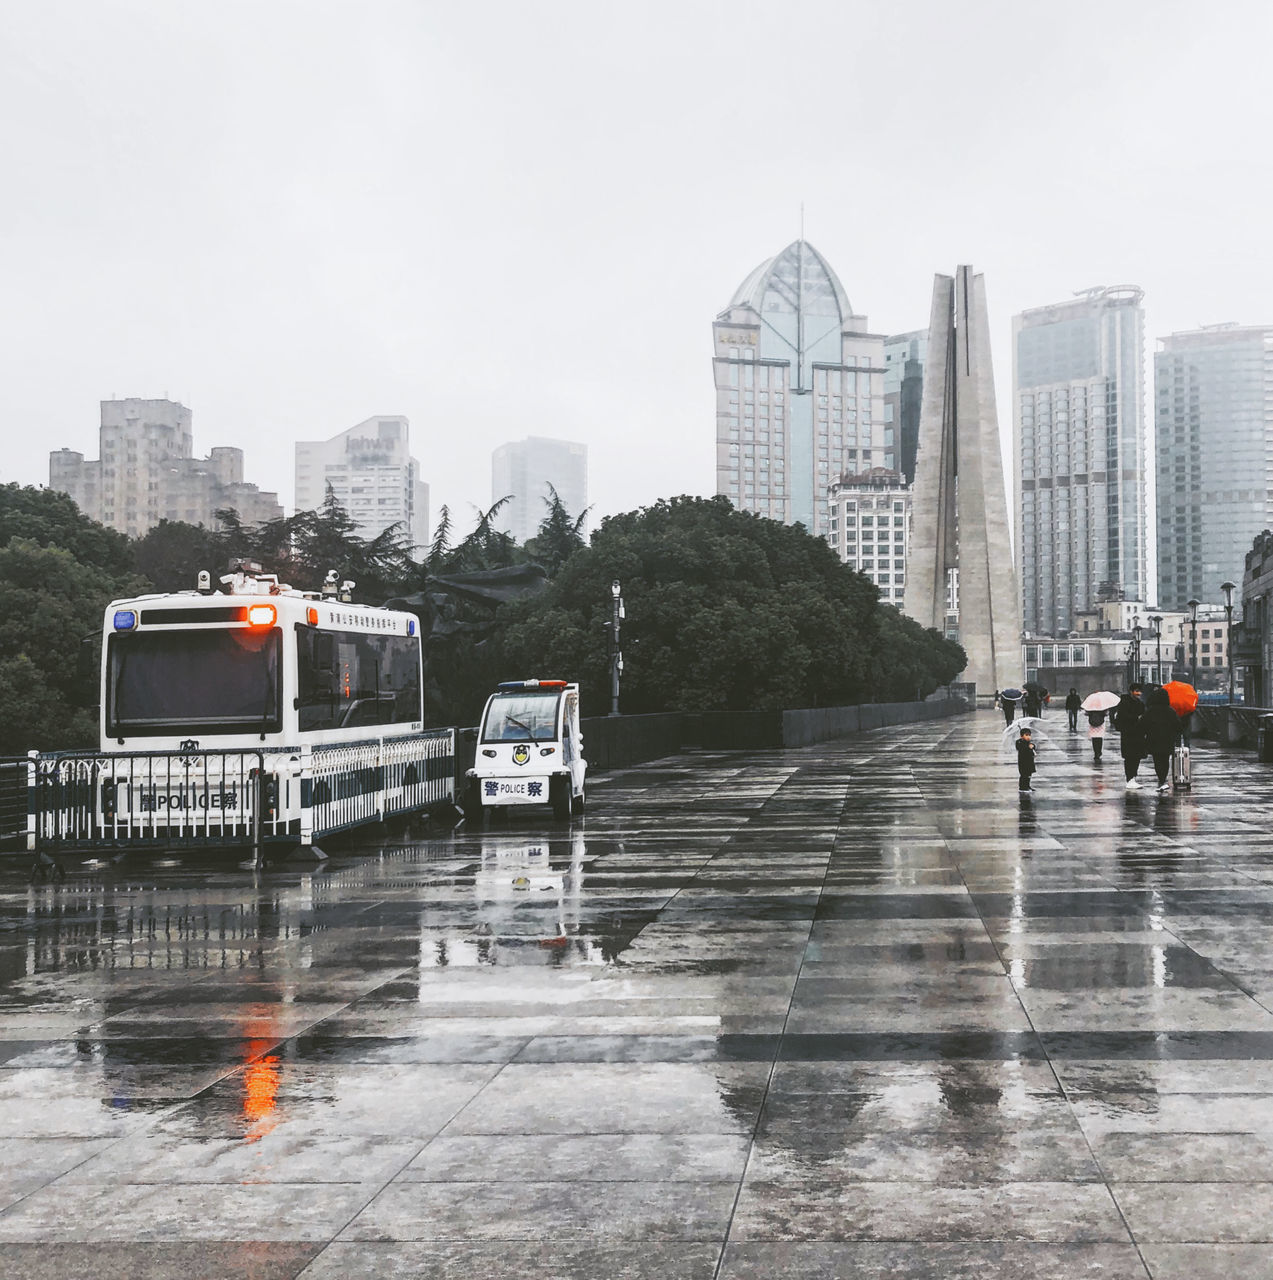 CITY BUILDINGS DURING RAINY SEASON